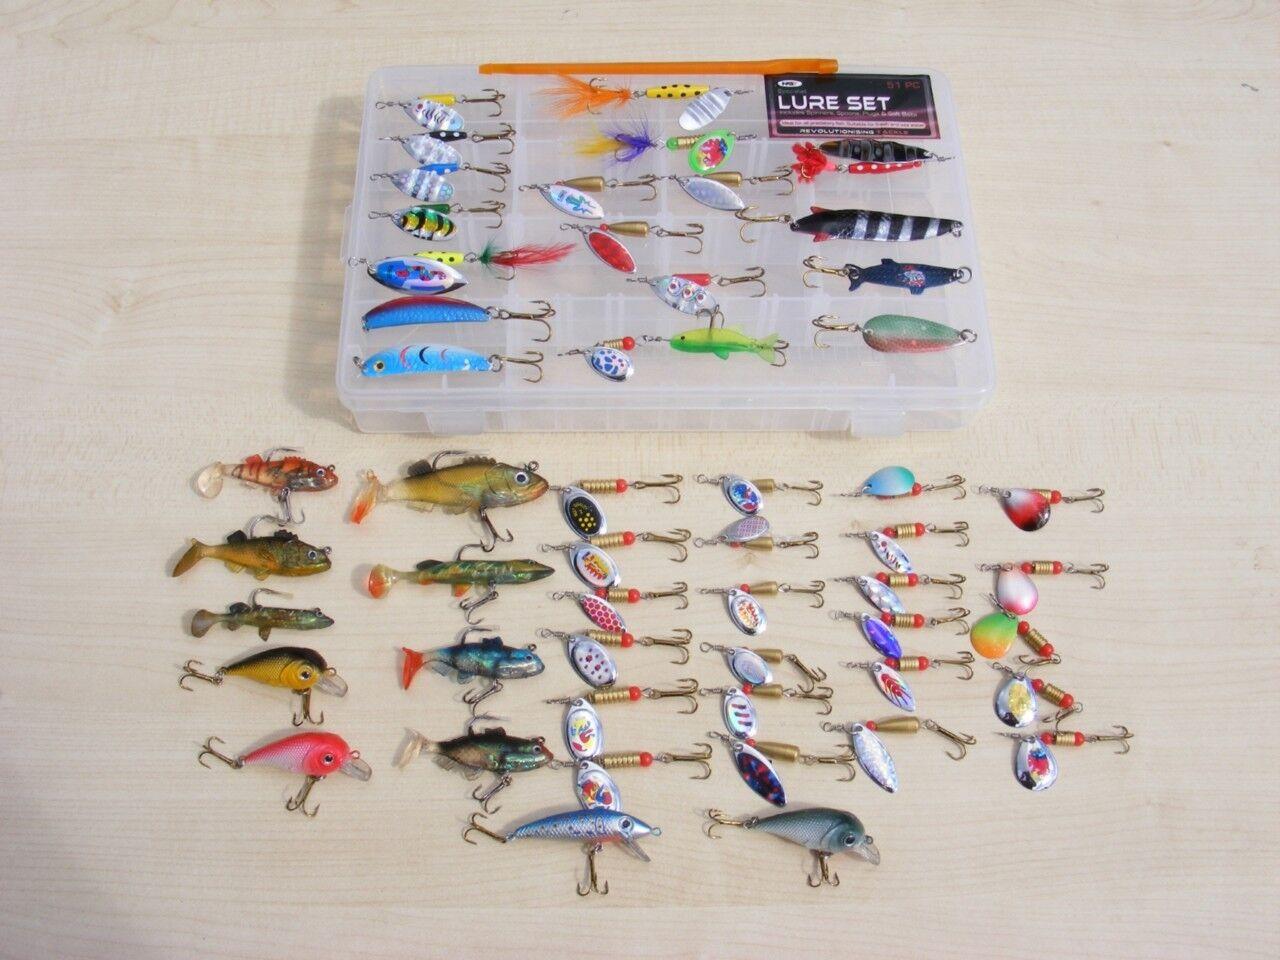 New 53Pc Fishing Lure Set Spinners, Plugs, Soft Baits 4 Perch,Trout, Pike Chubb